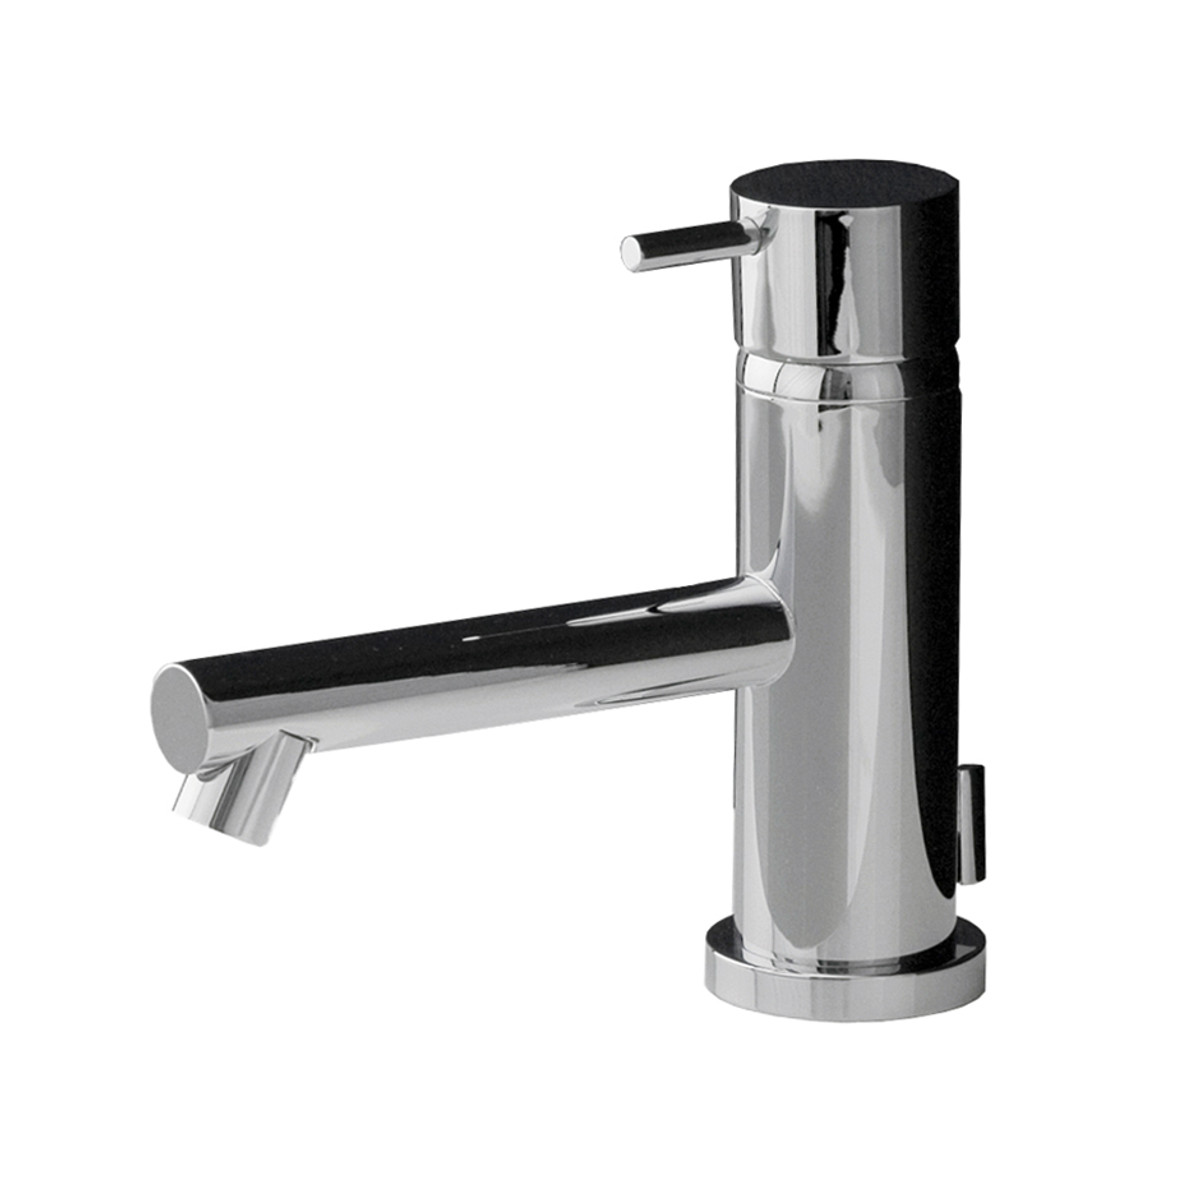 0112L Minimal Deck Faucet